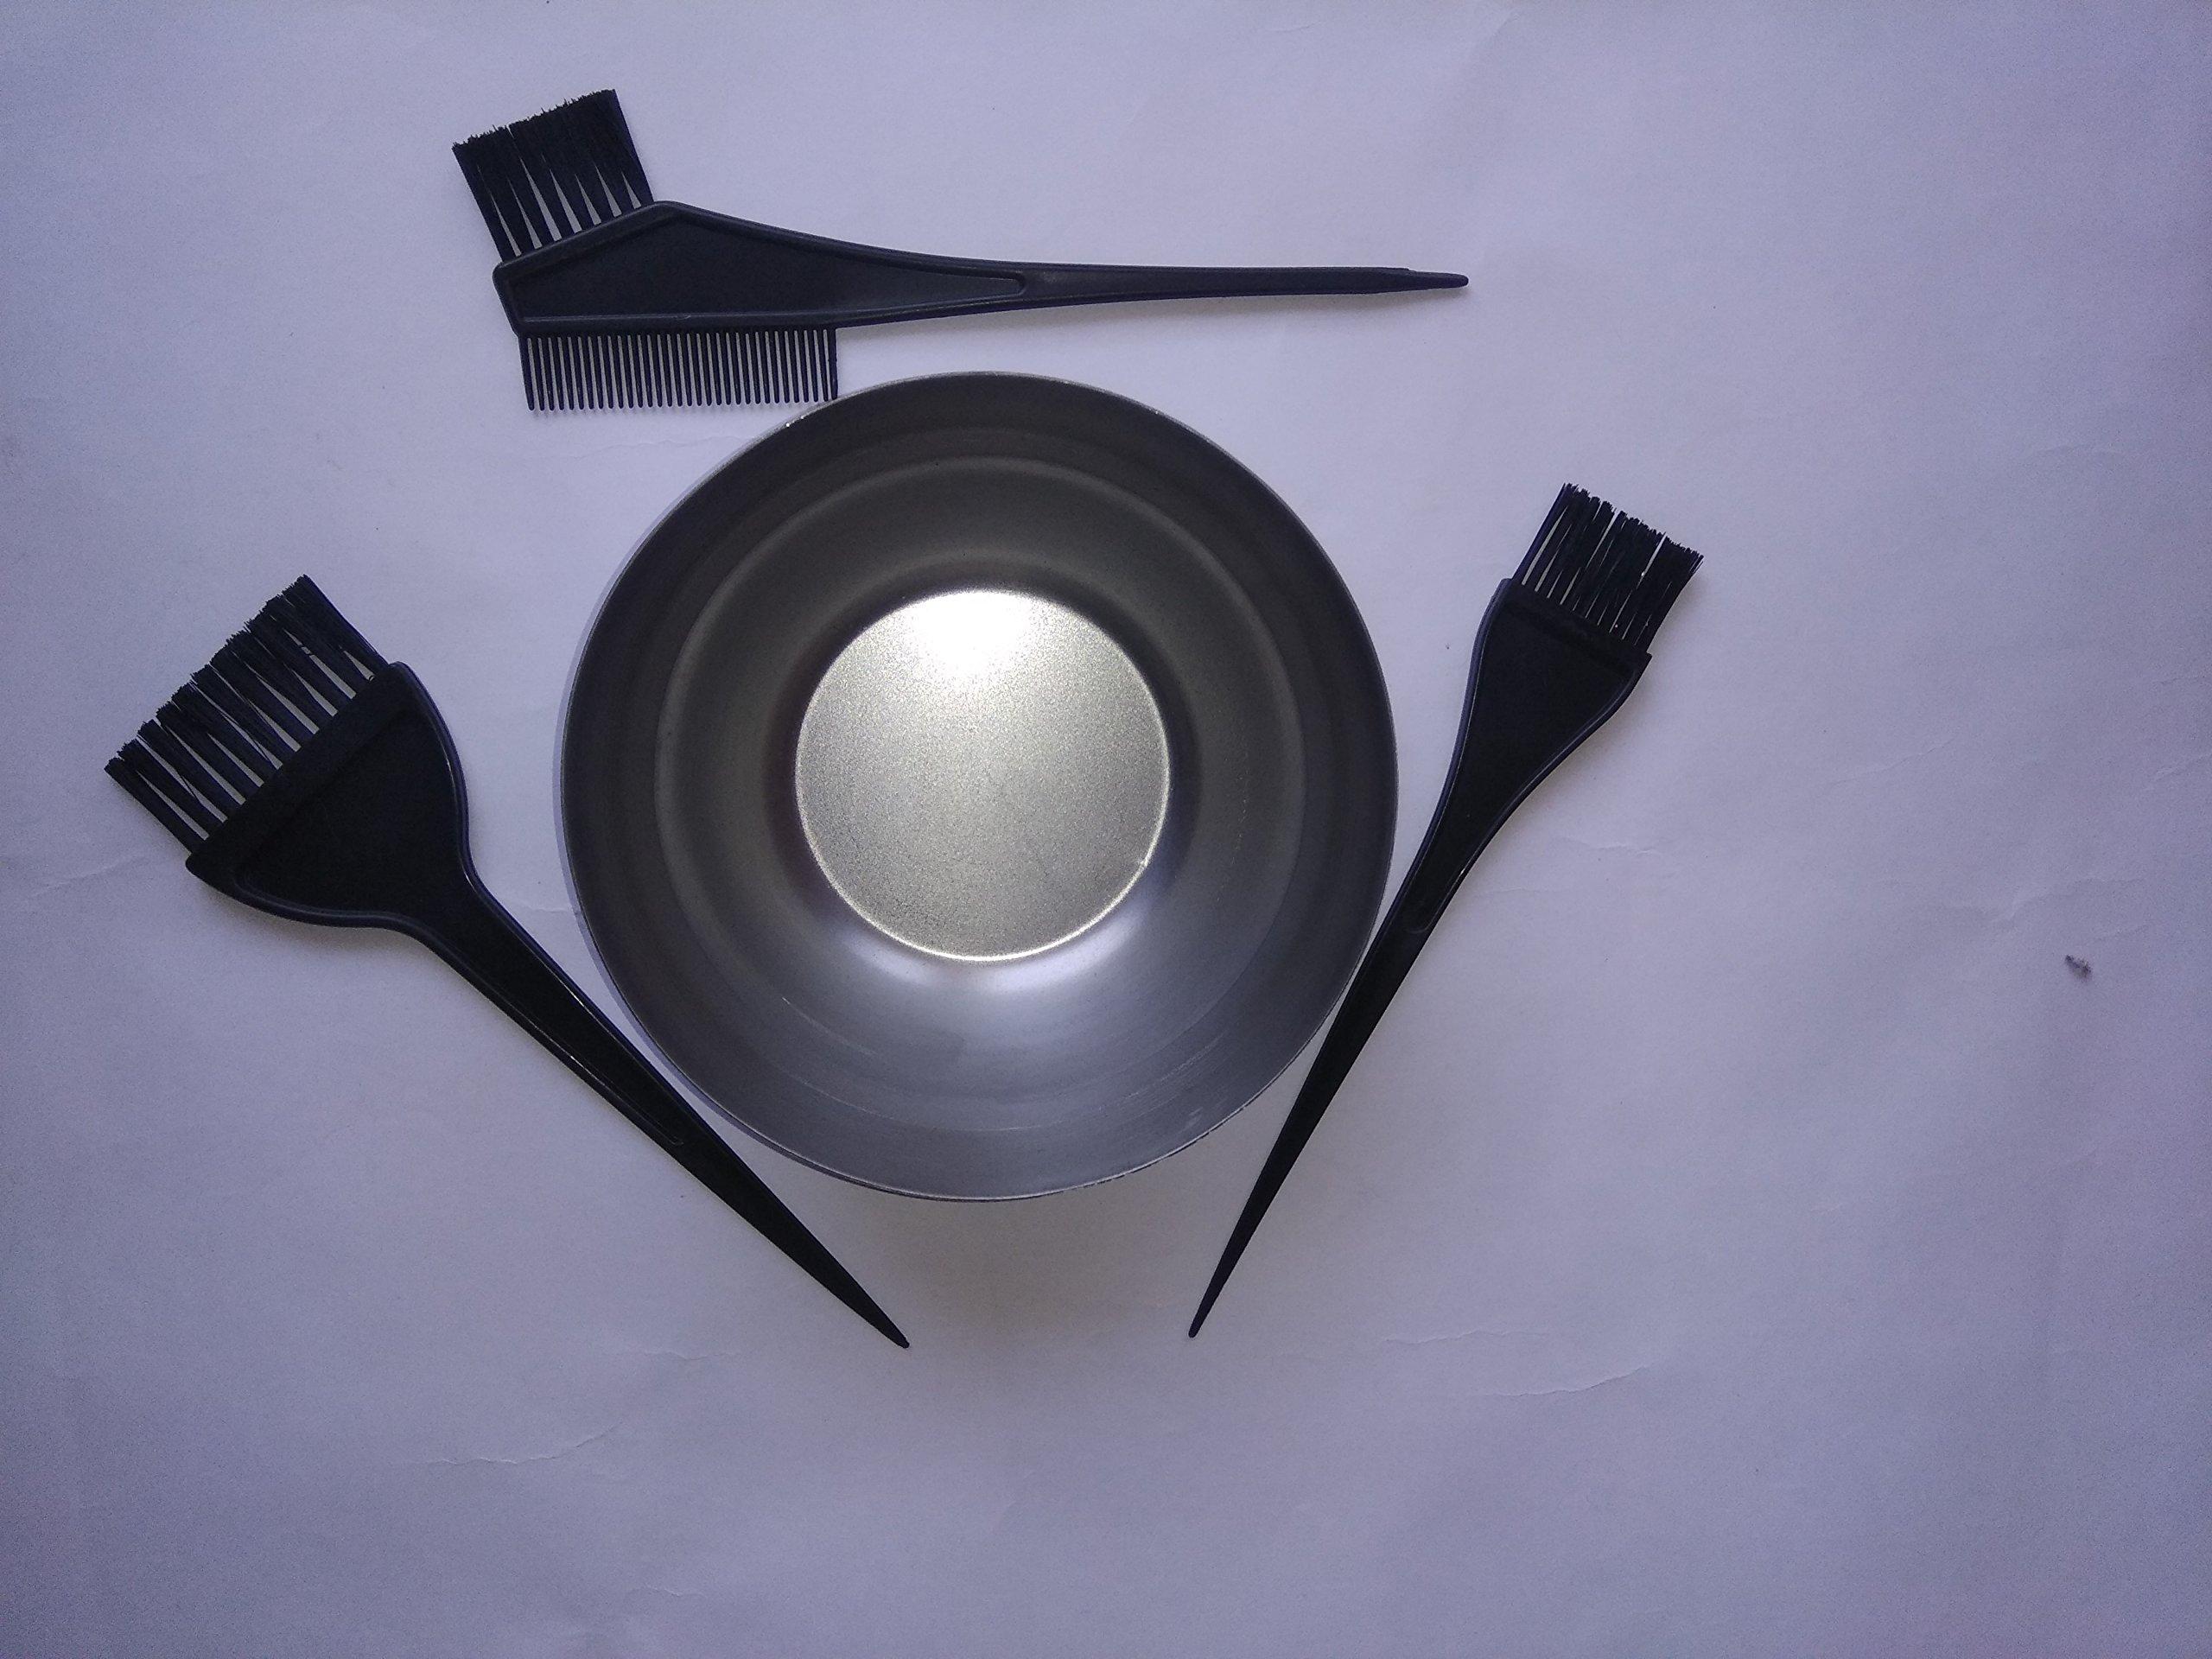 Heavy Duty Cast Iron Henna Bowl Mehendi Mixing Plate, Handmade Heena Metal Vessel for Making Natural Hair with Hair Dye Brush Set Black (3pcs Hairdressing Brushes)